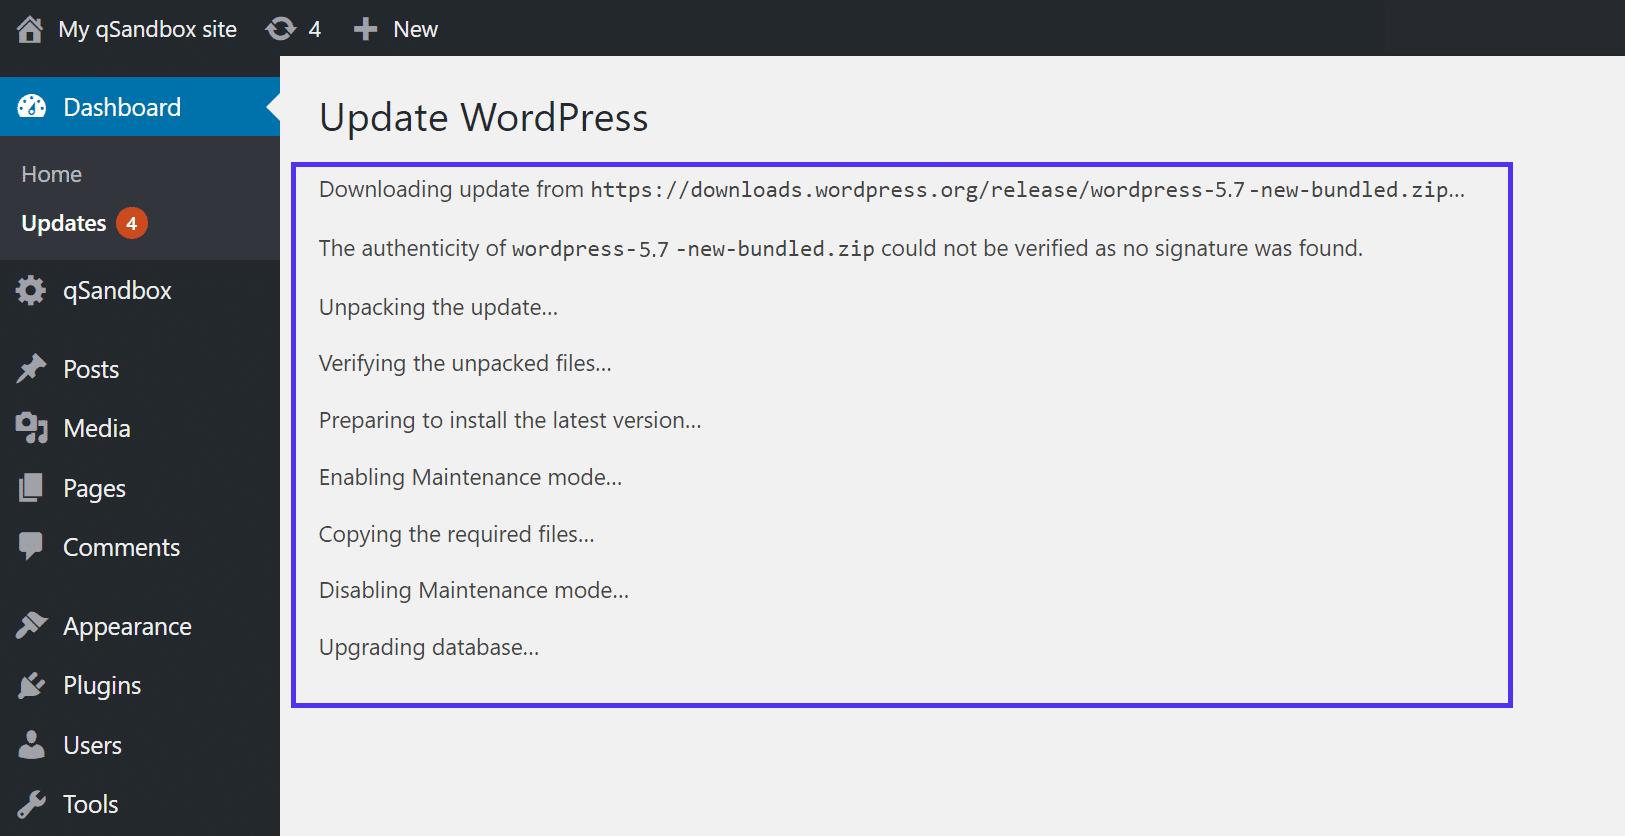 WordPress更新期间显示的信息